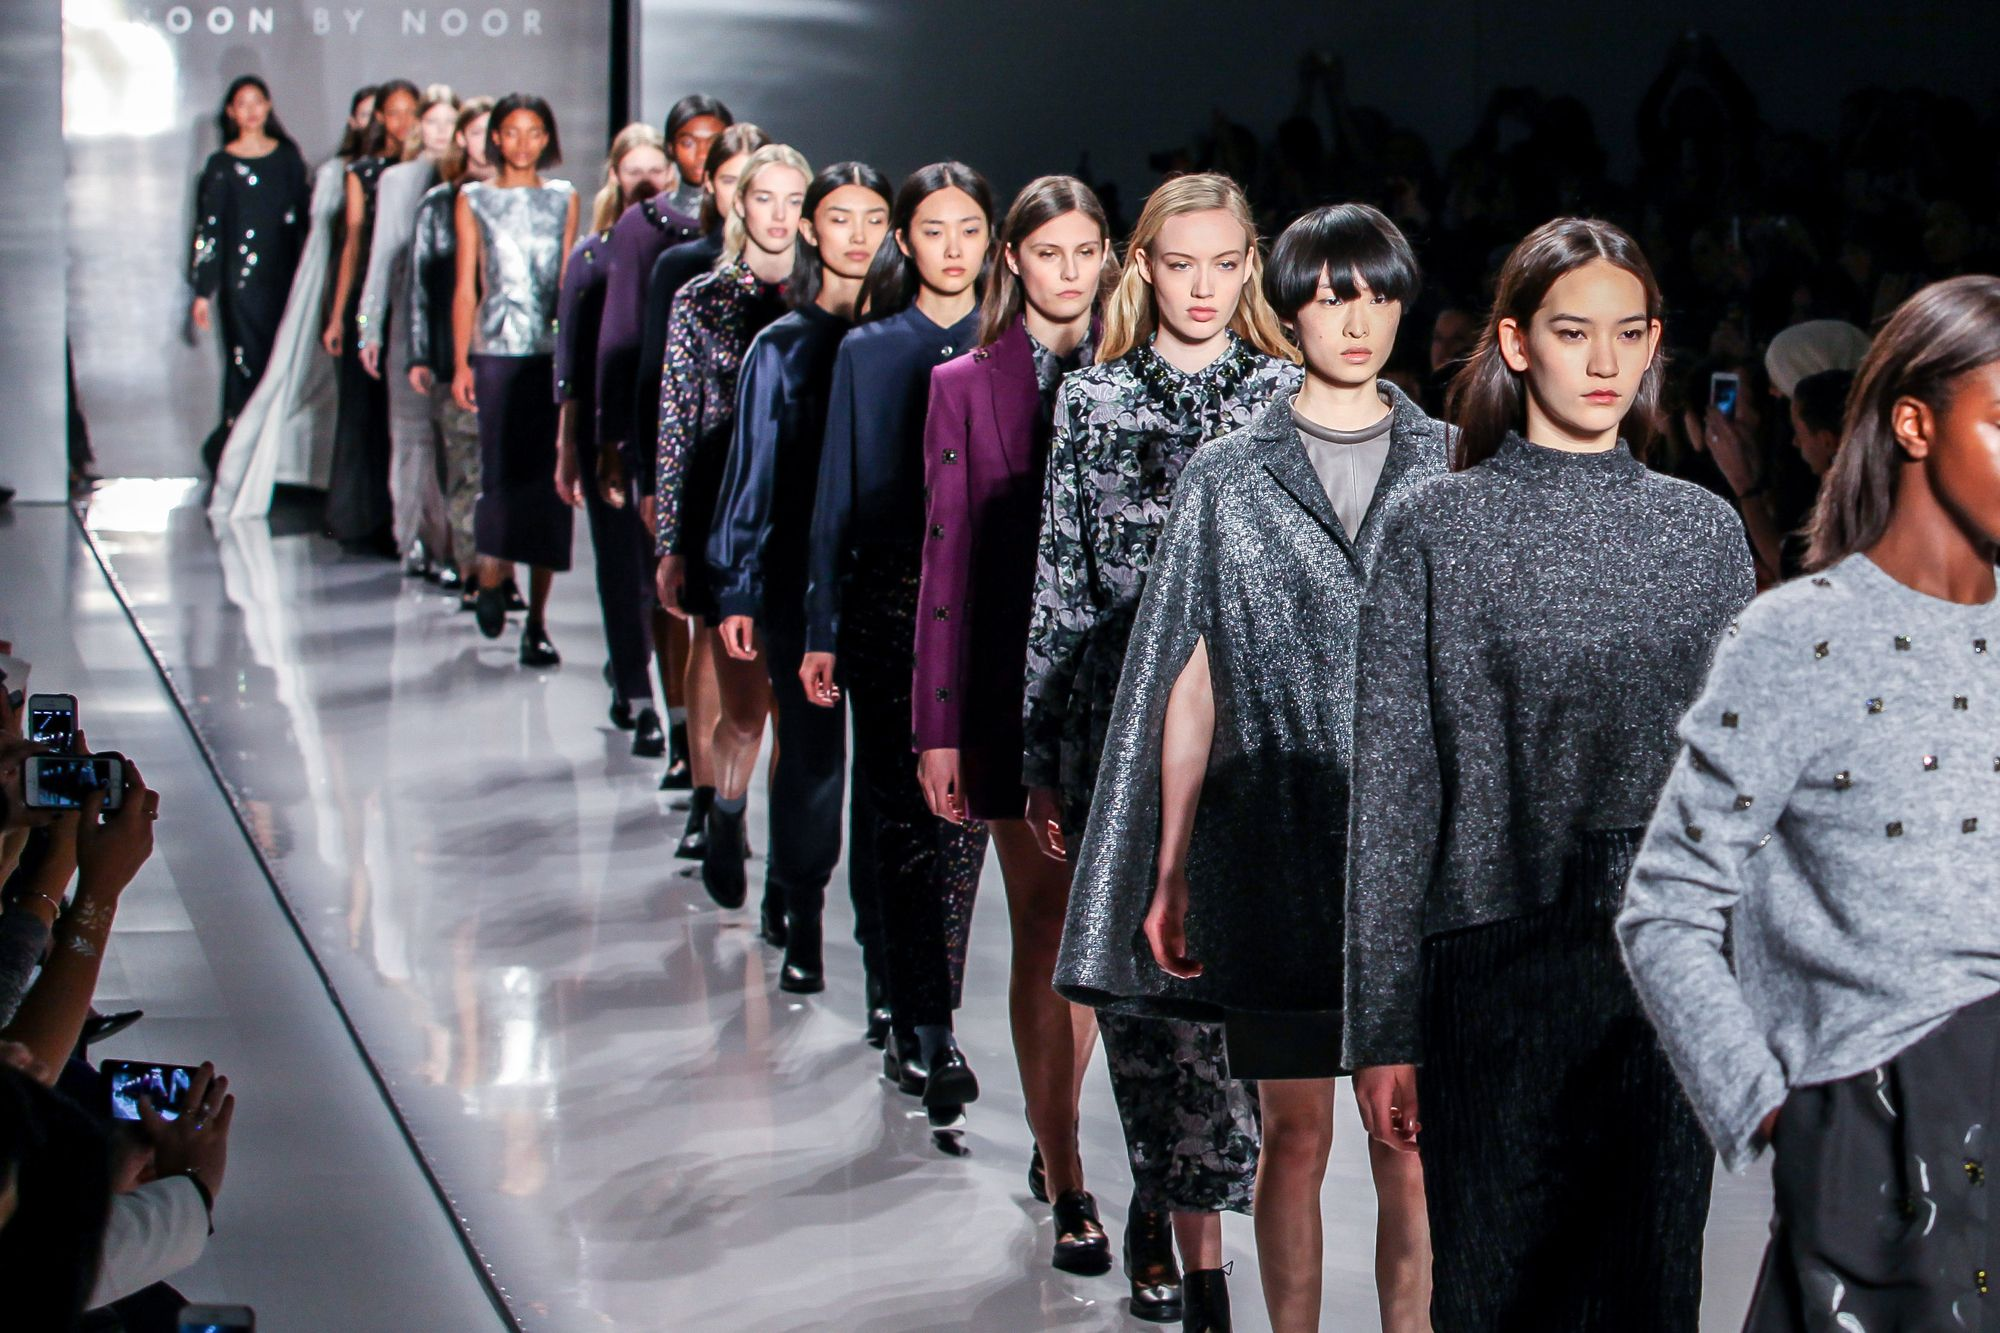 Live Stream of Runway Shows @ New York Fashion Week 49